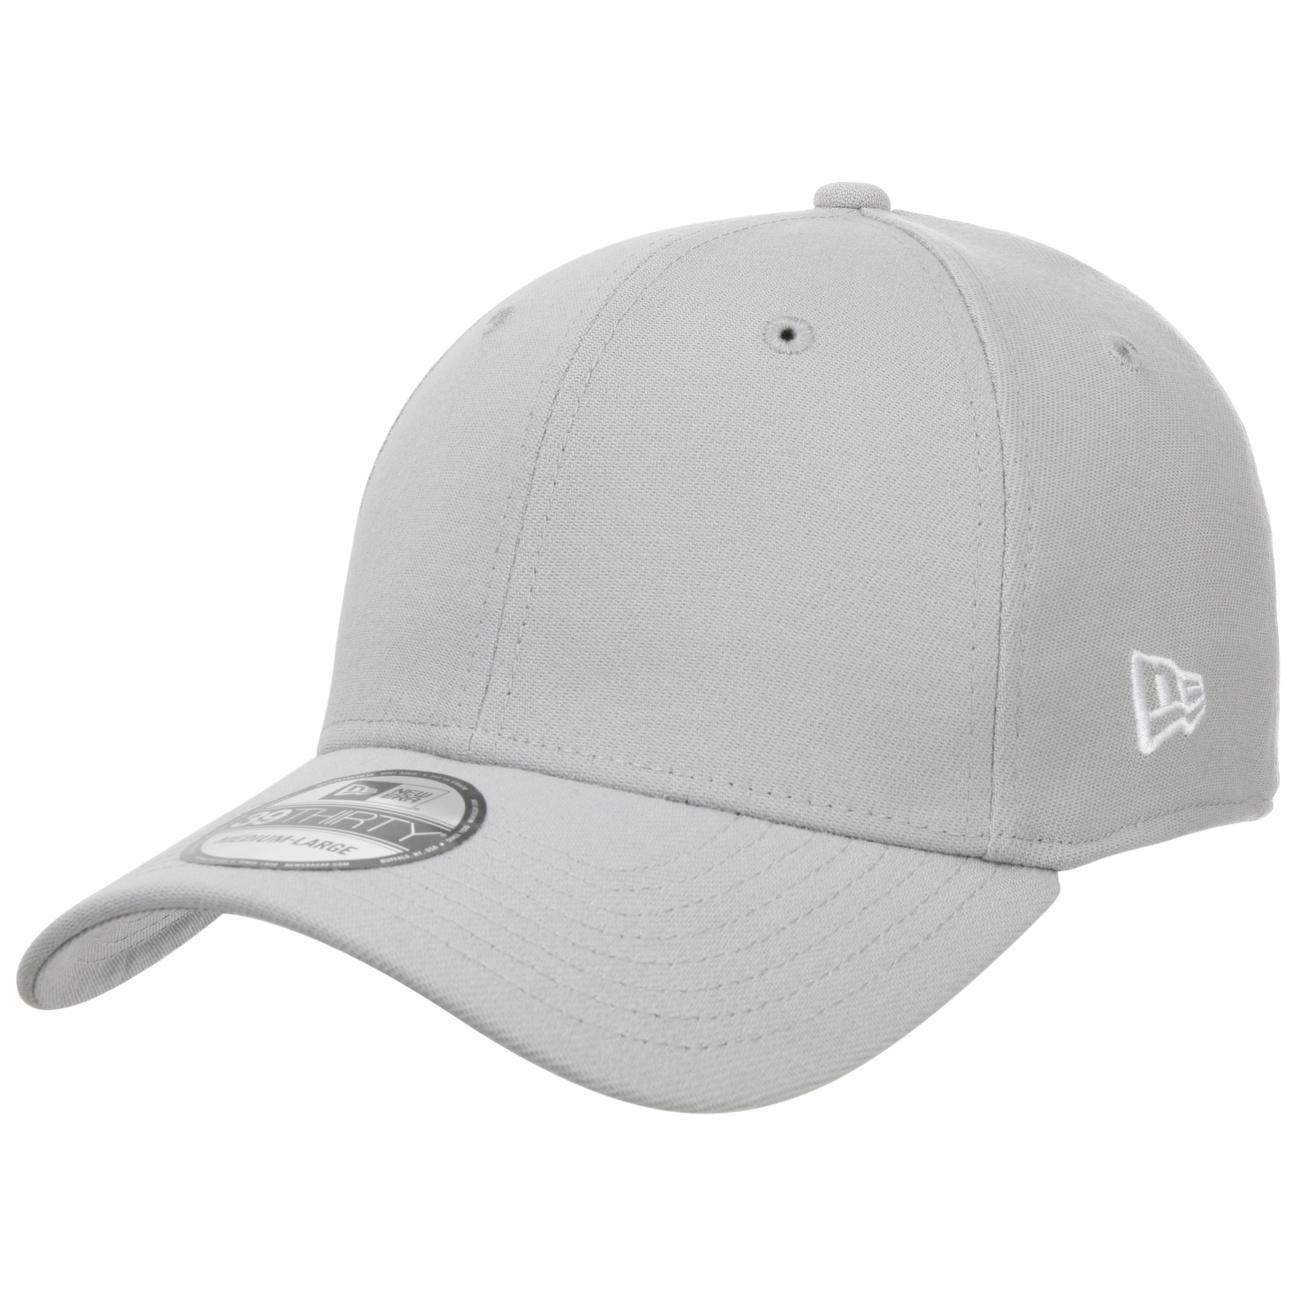 80dd973918735 ... 39Thirty Blank Baseball Cap by New Era - gris 5 ...